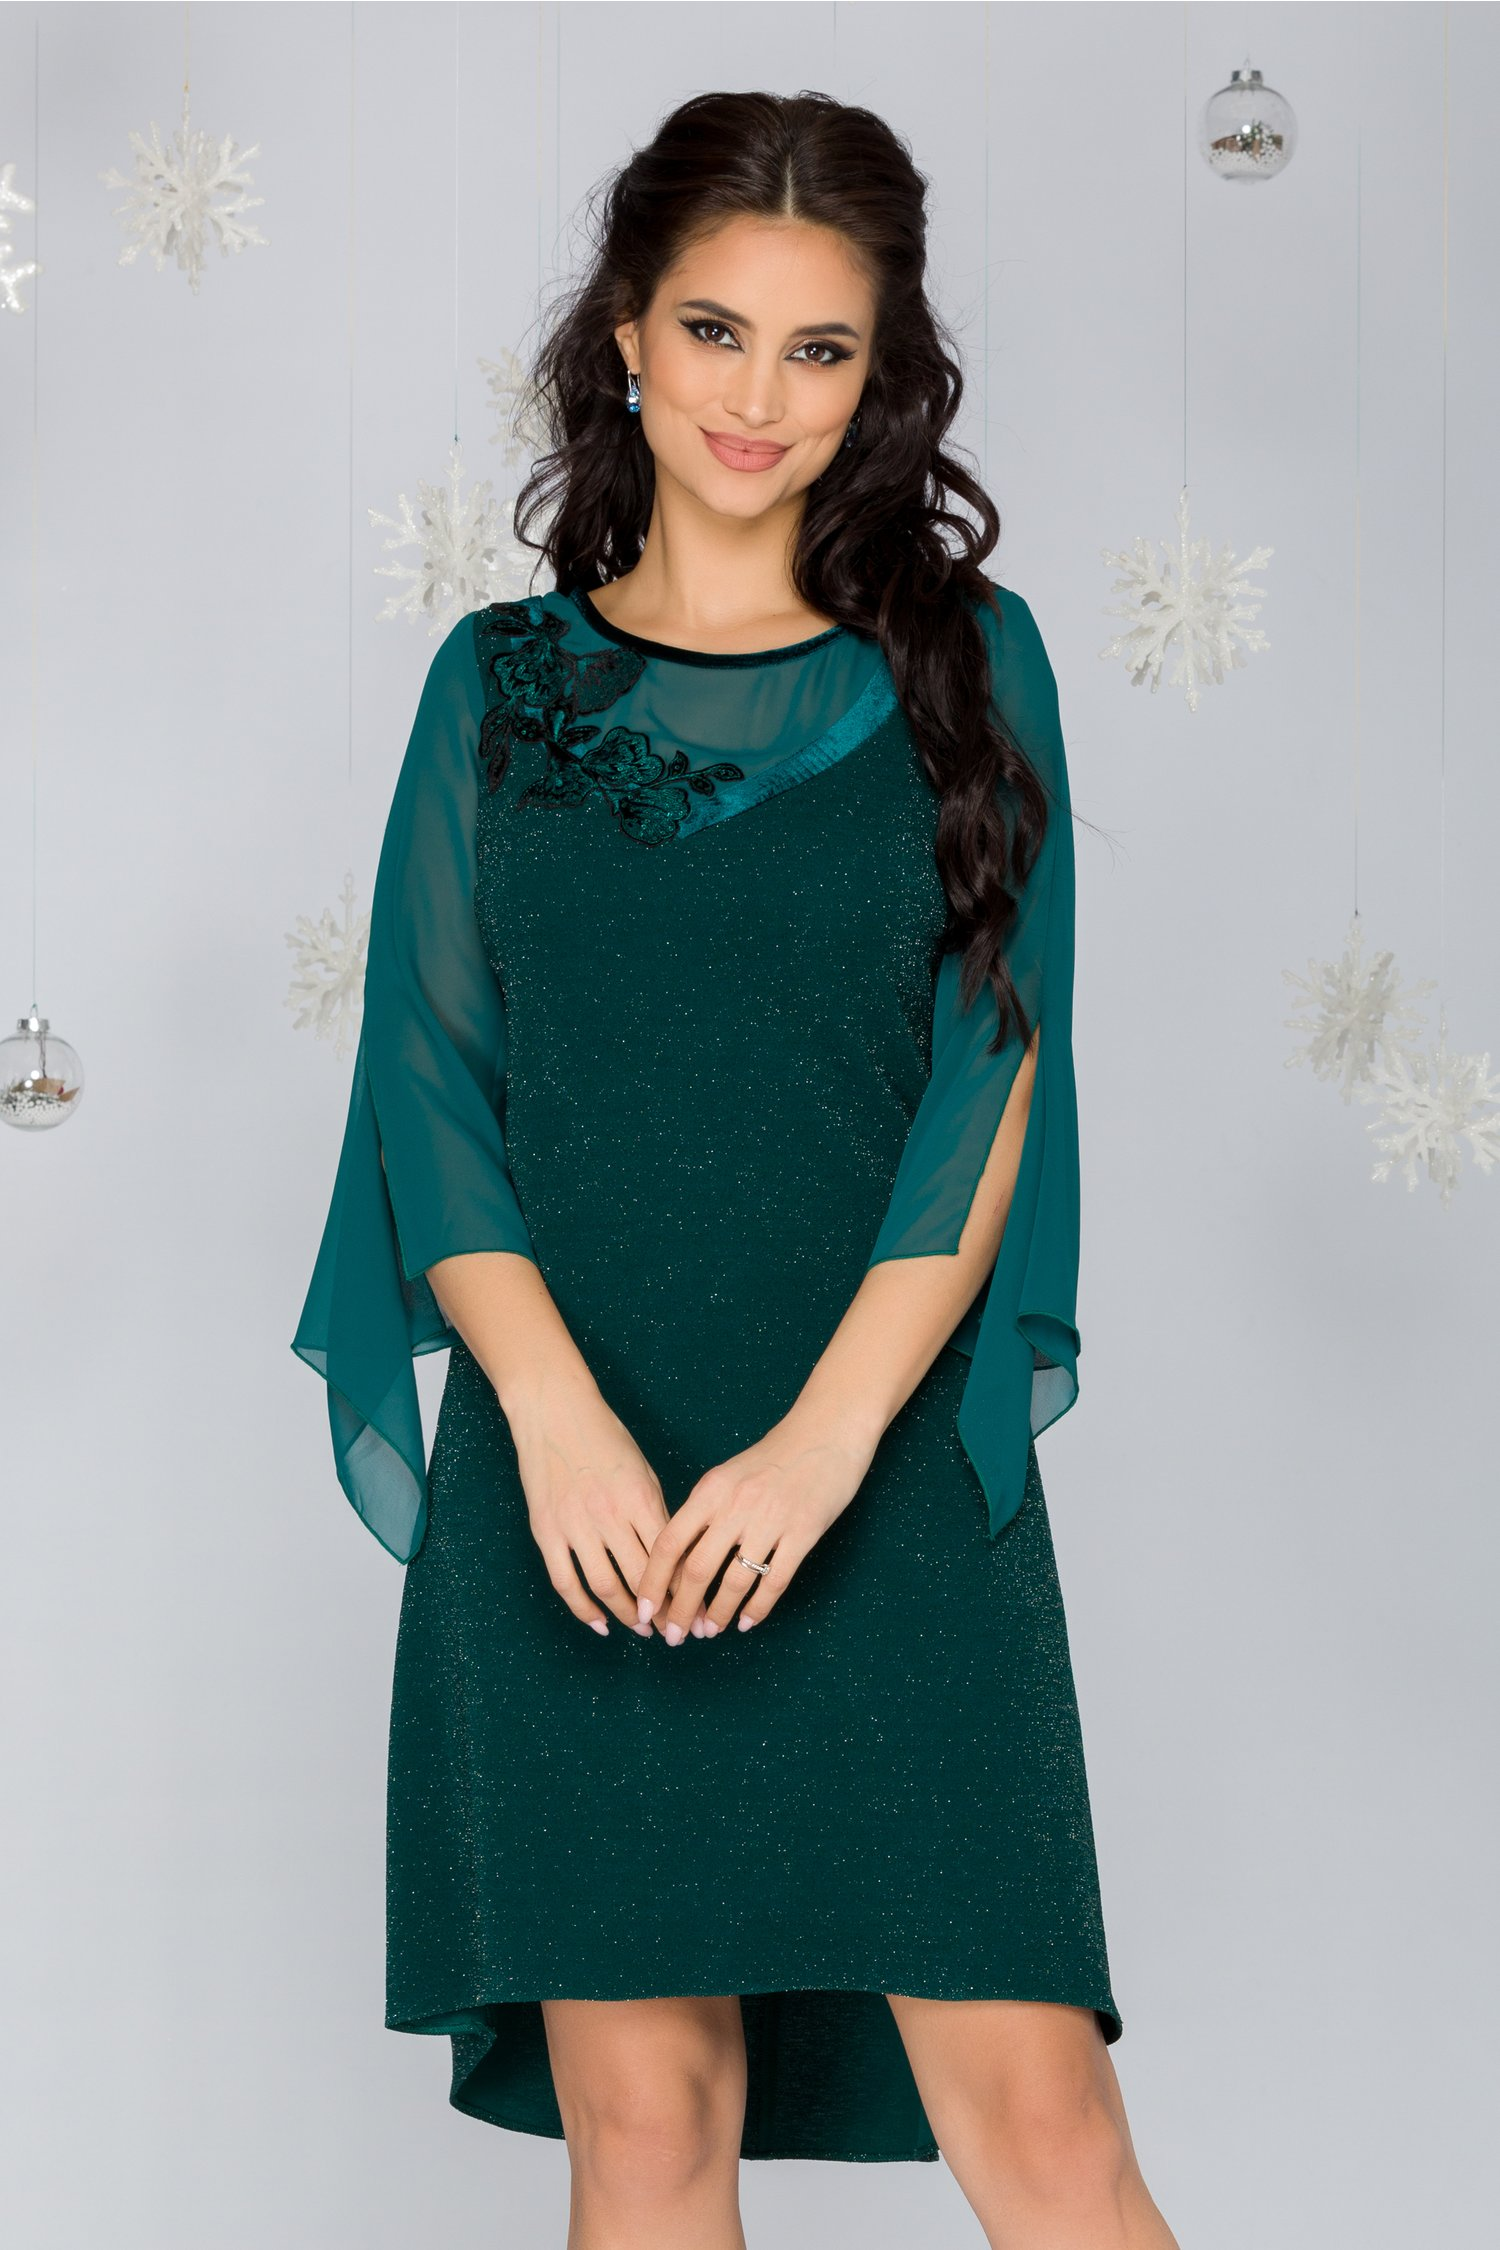 Rochie FanyLux verde din lurex cu catifea si broderie florala la bust